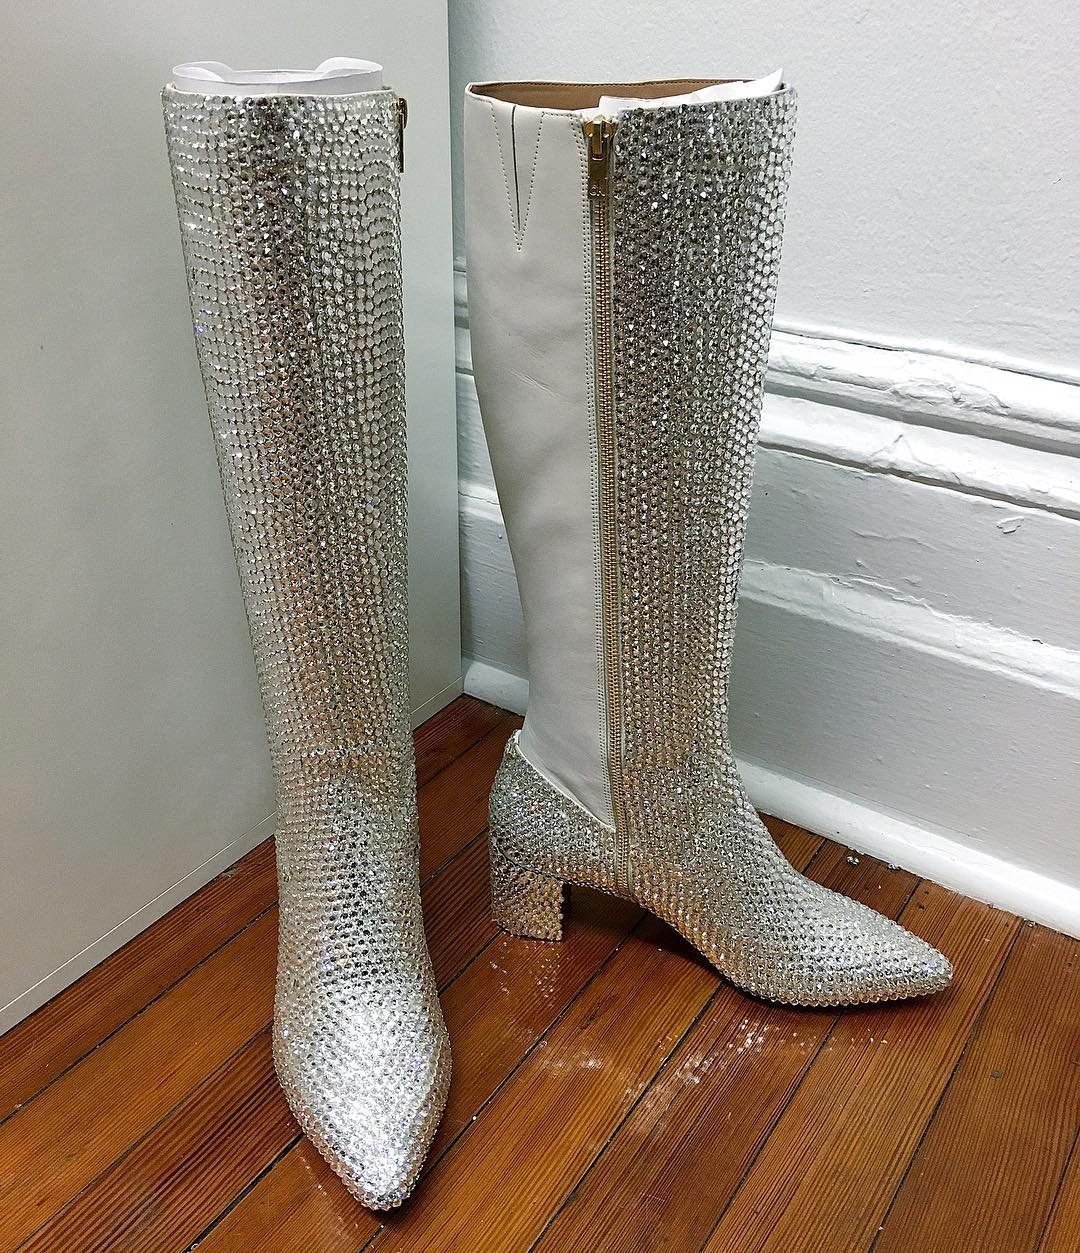 lady Gaga Boots Dive Bar Tour Product Shot.jpg